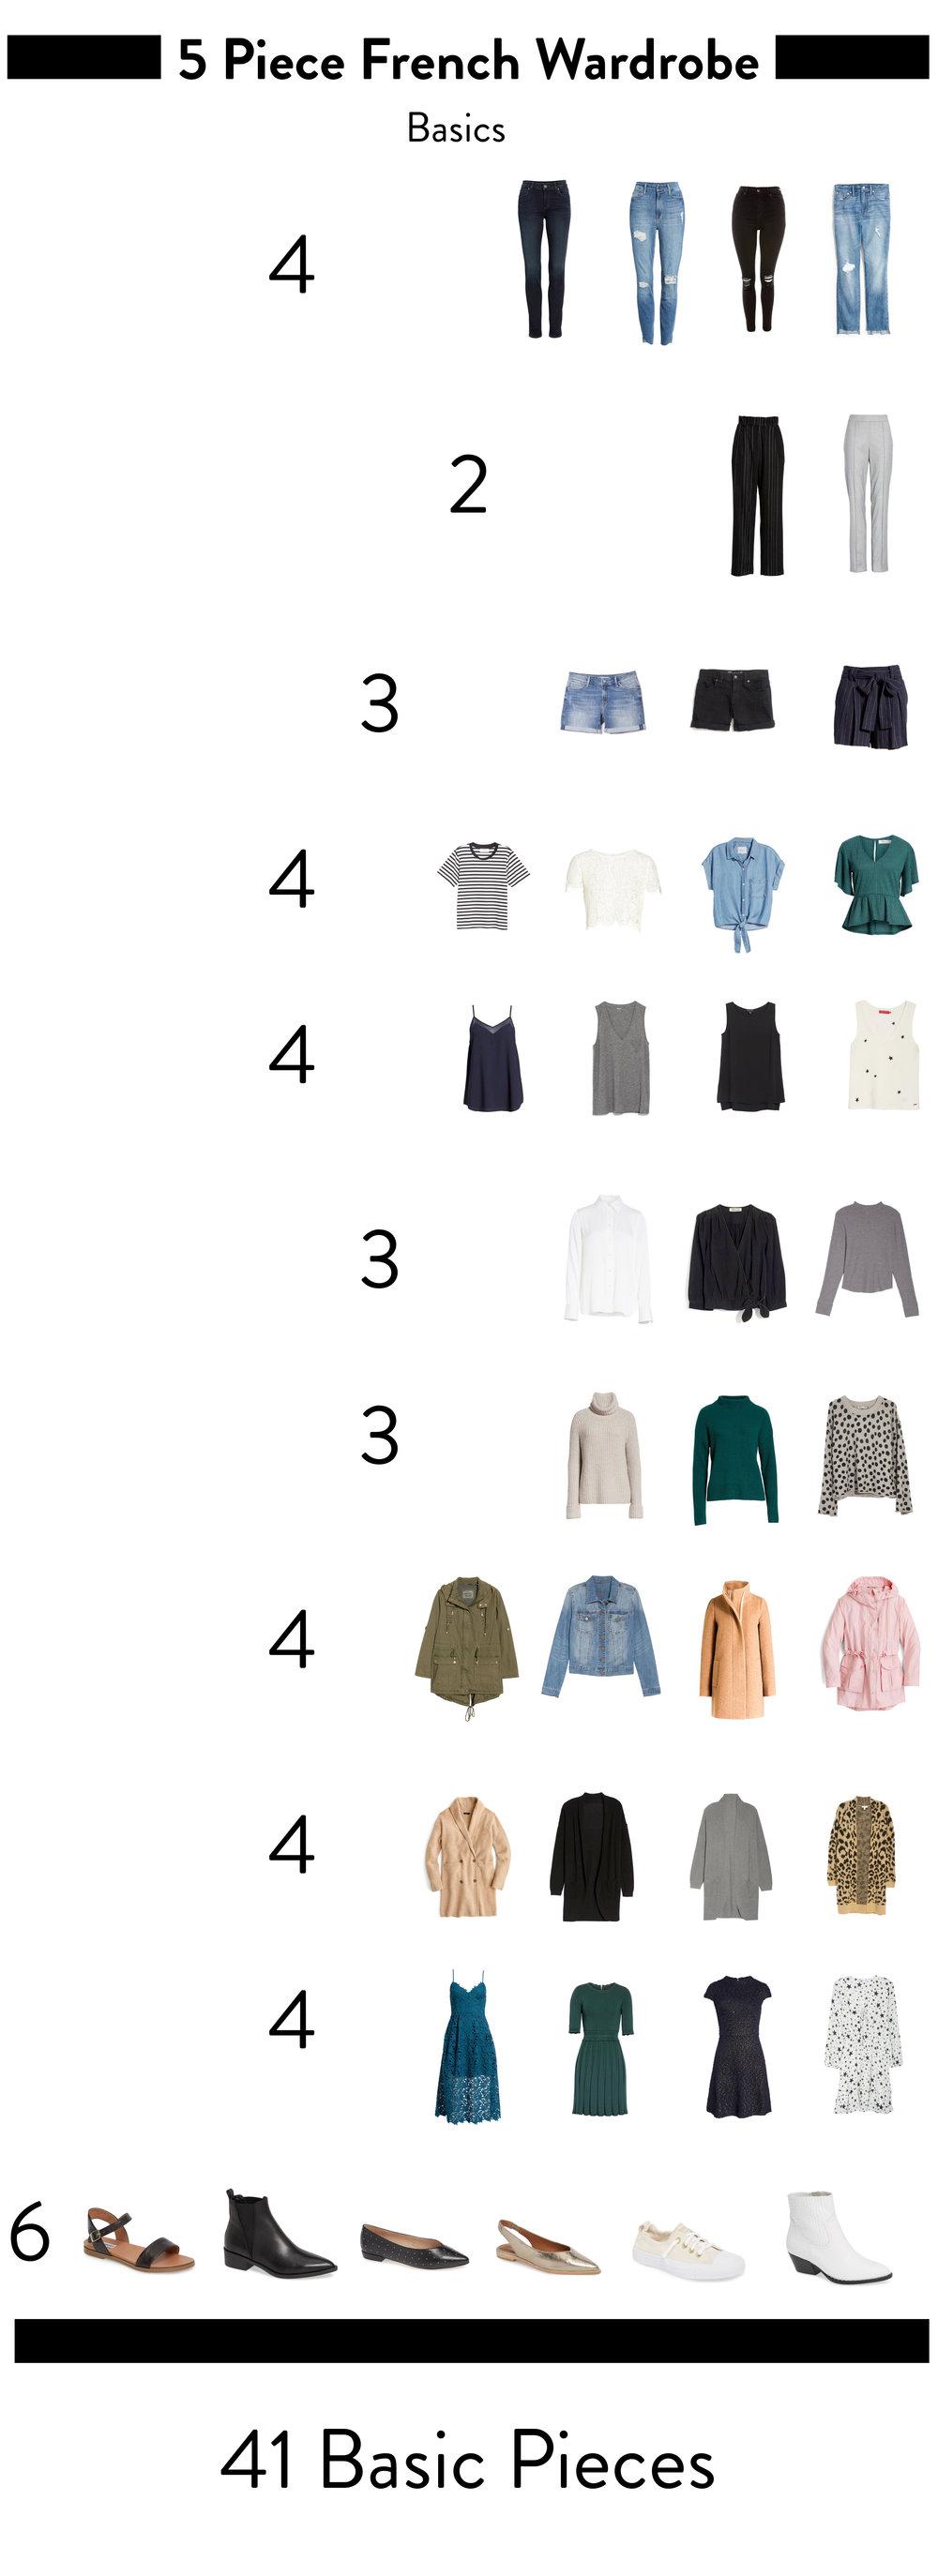 5-piece-french-wardrobe-basics